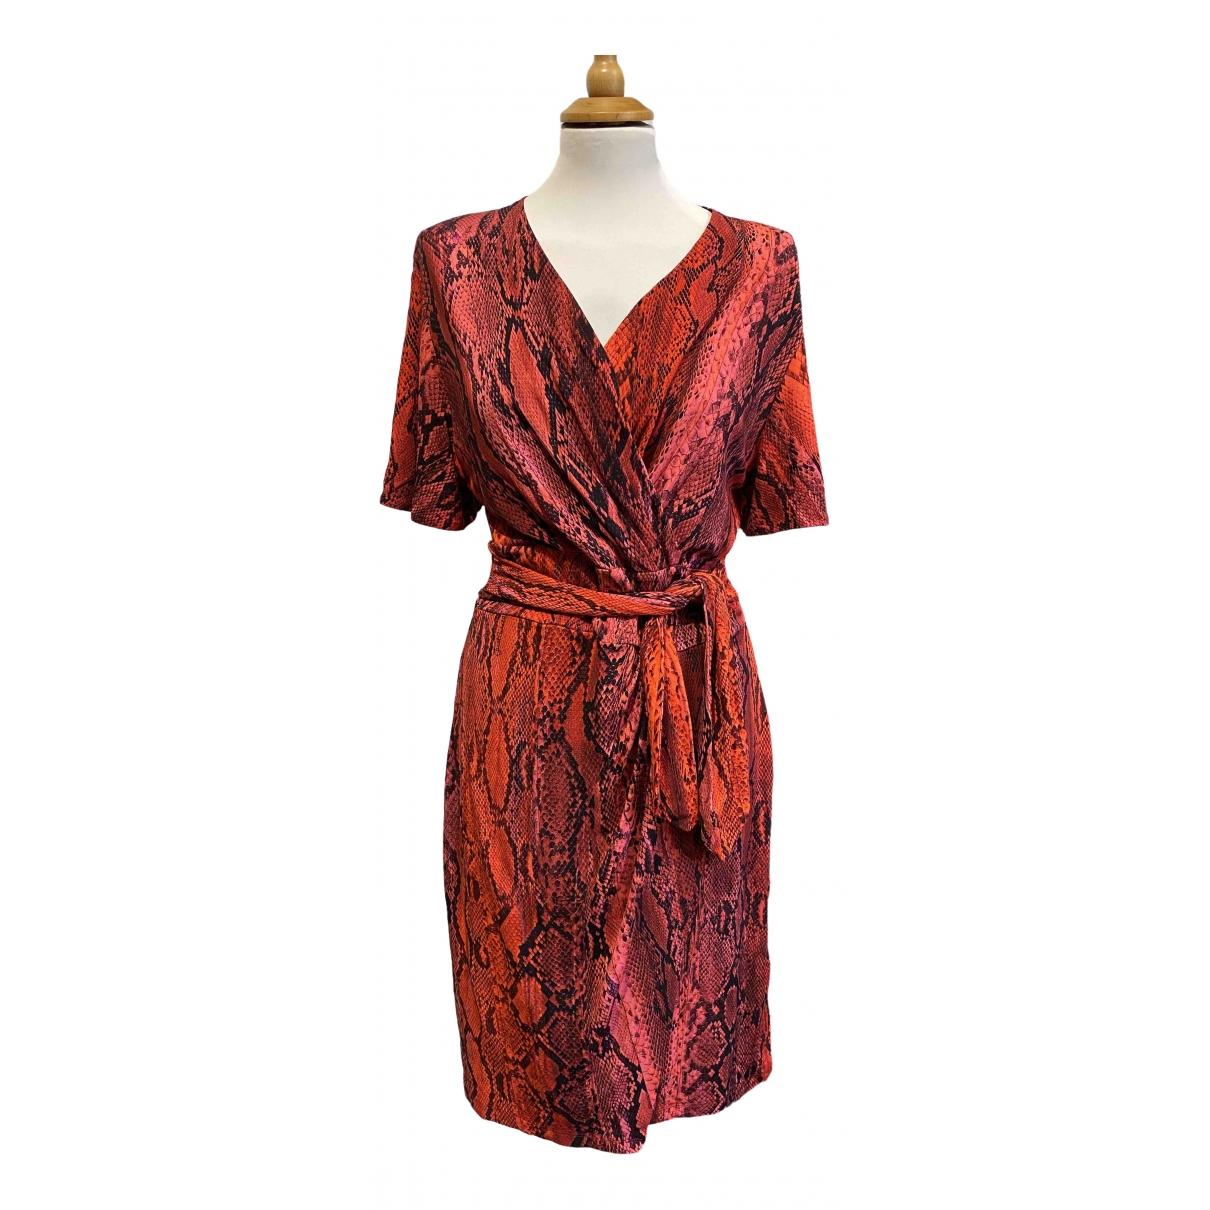 Just Cavalli \N Multicolour dress for Women 46 IT